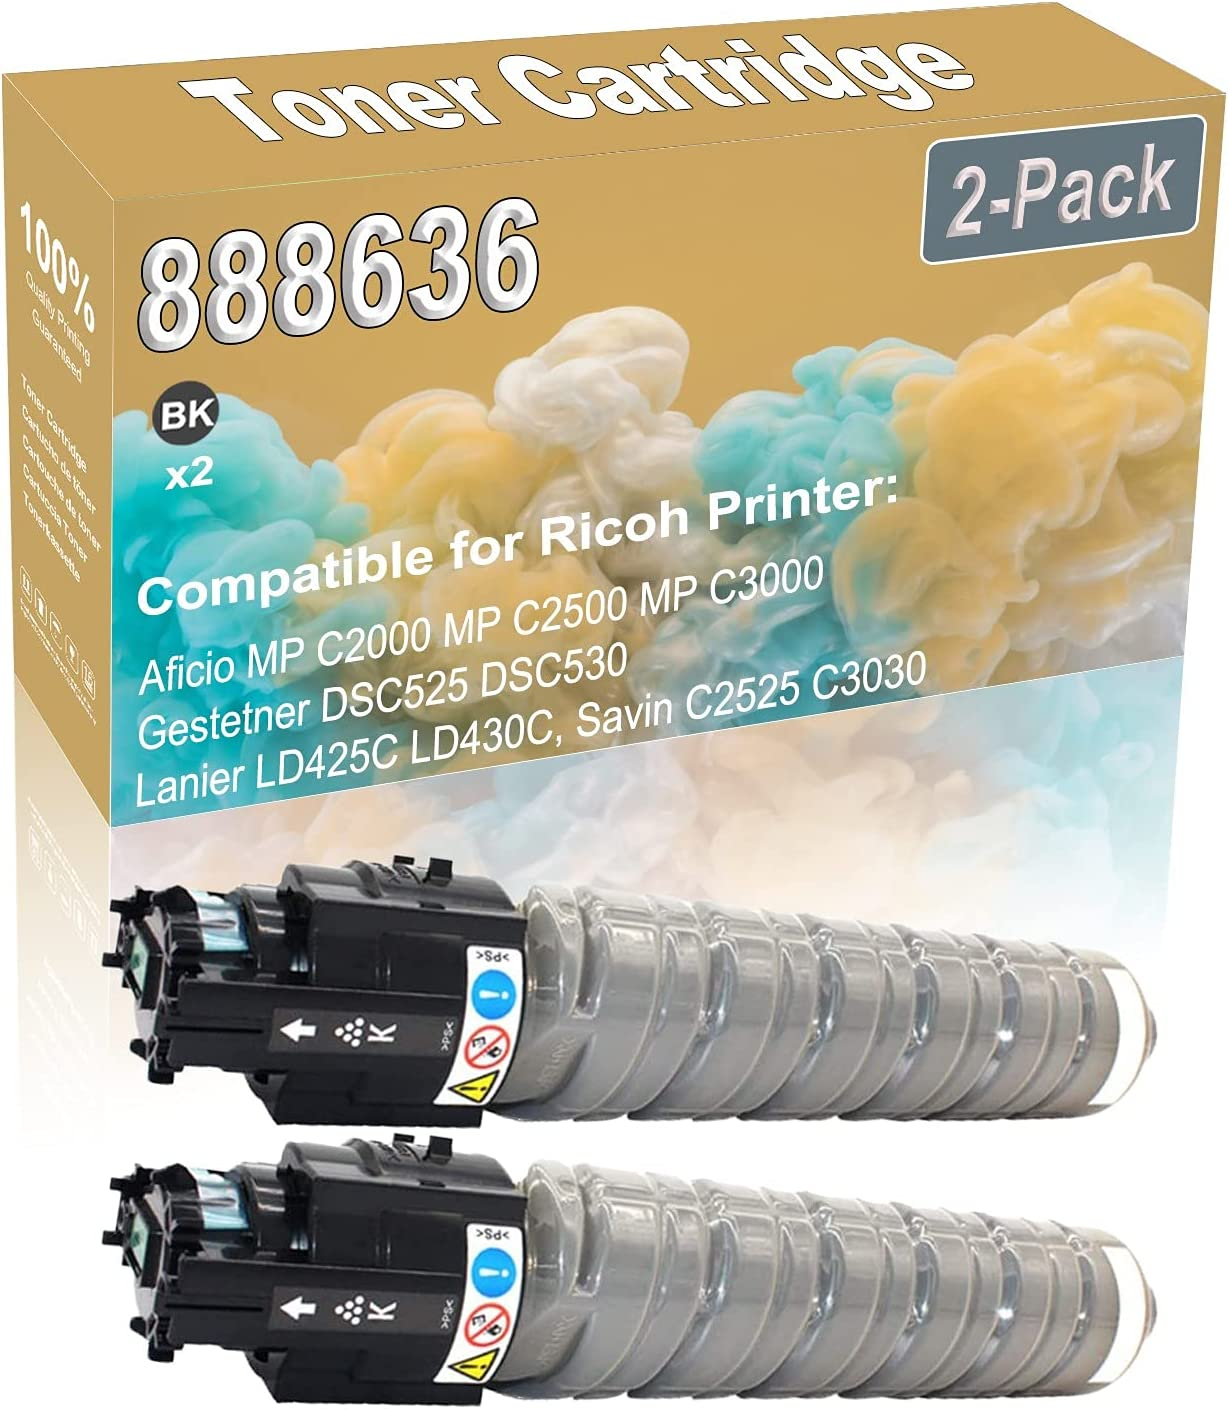 2-Pack (Black) Compatible Aficio MP C2000 MP C2500 MP C3000 Laser Printer Toner Cartridge (High Capacity) Replacement for Ricoh 888636 Printer Toner Cartridge